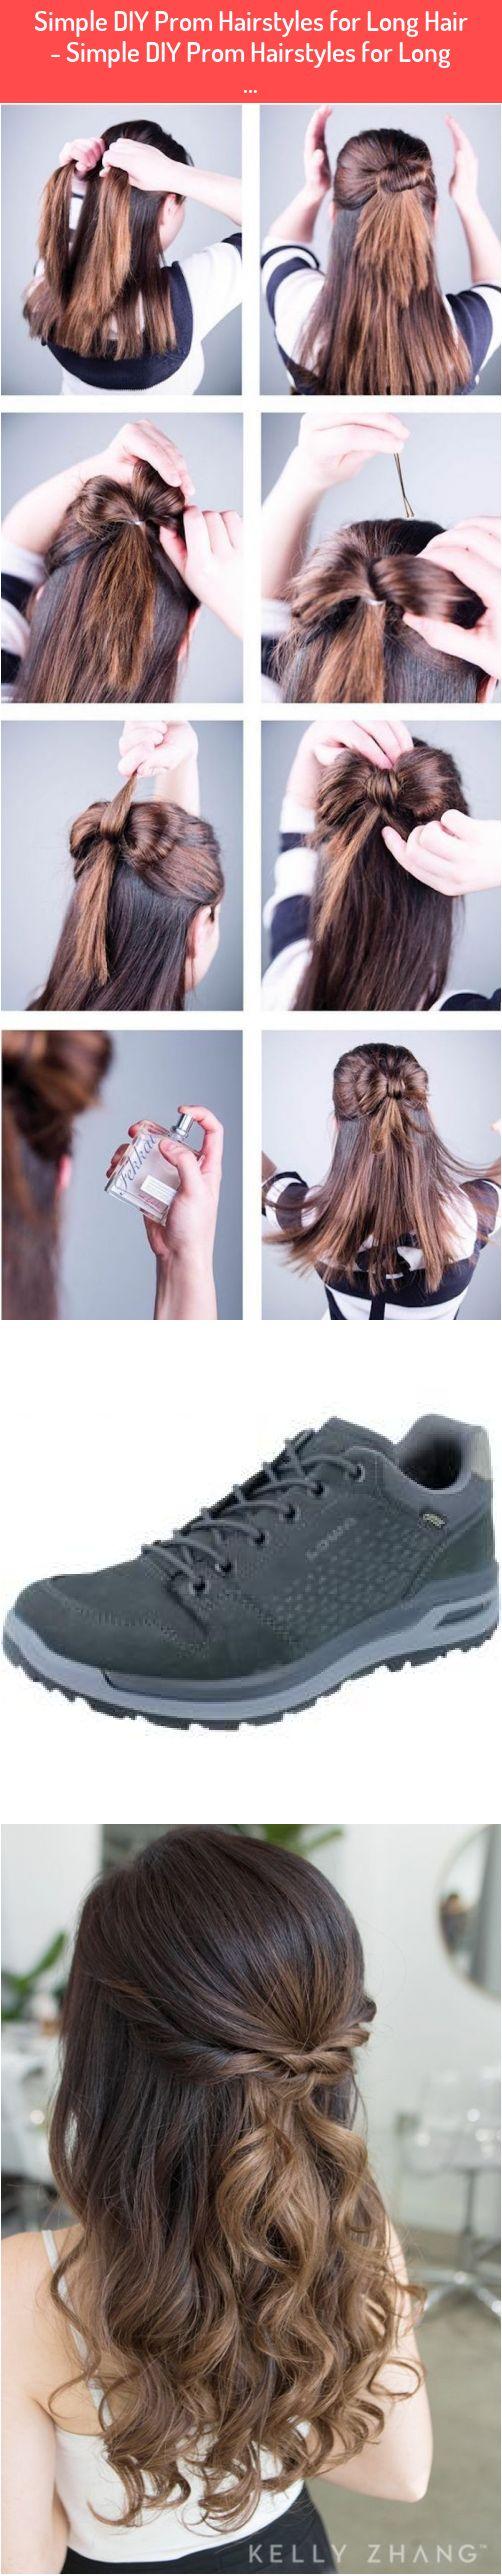 Simple DIY Prom Hairstyles for Long Hair - Simple DIY Prom ...